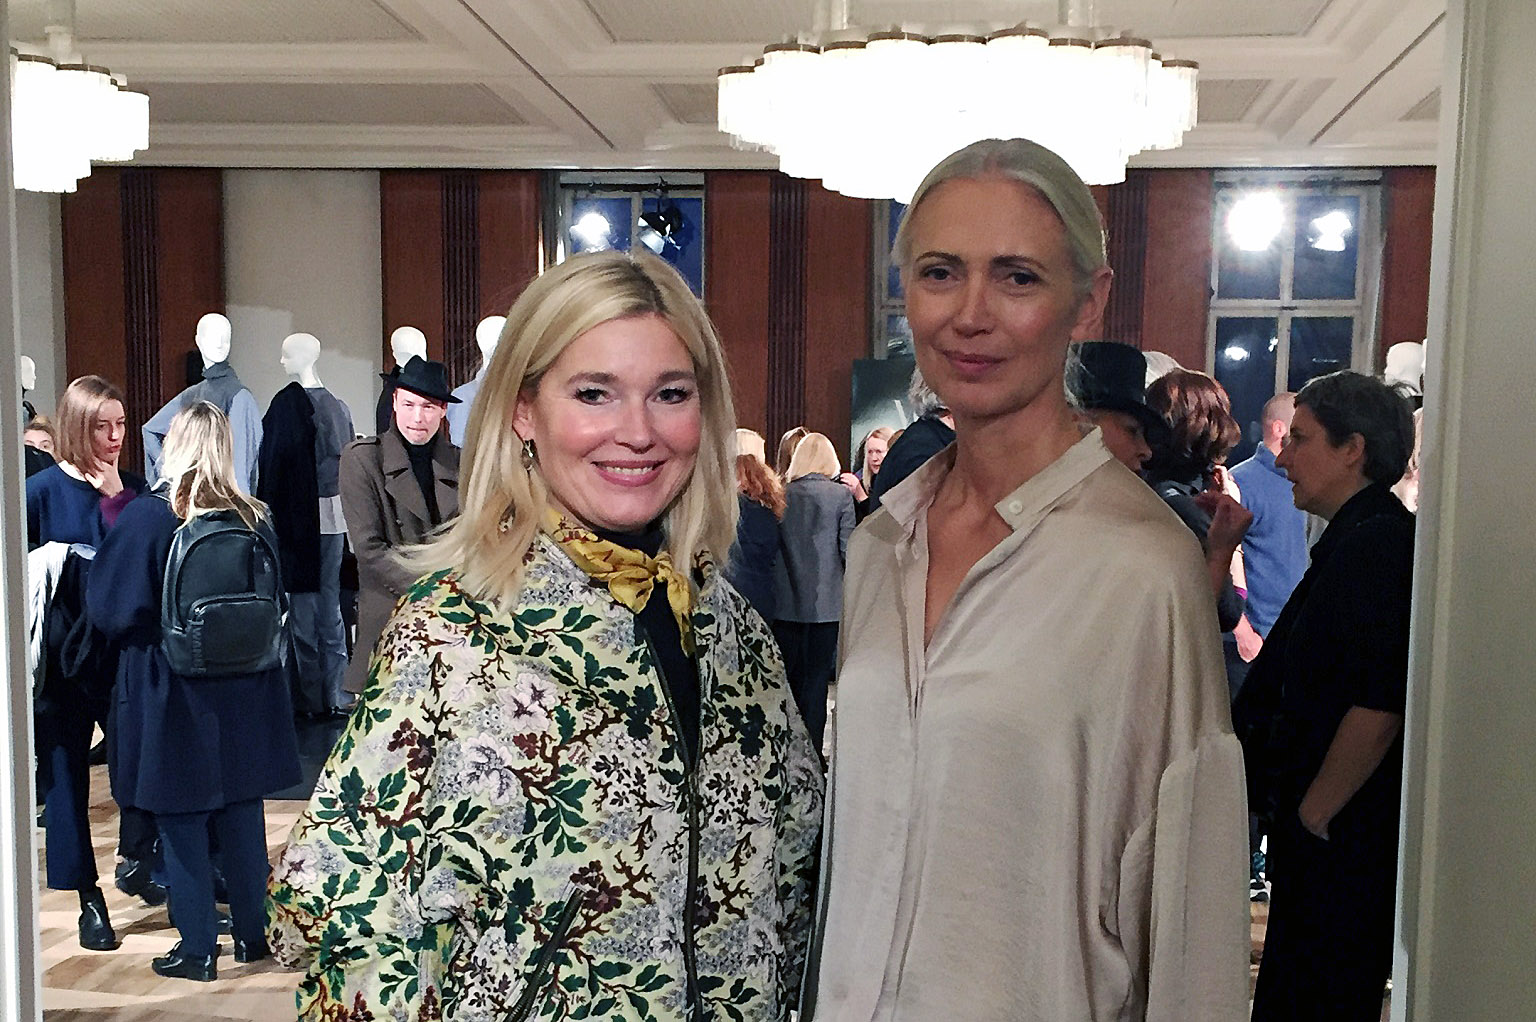 Petra Dieners Bloggerin, Christiane Arp Vogue, Berliner Salon, Vogue Fashion Salon, Fashionblog Lieblingsstil, Modeblog Lieblingsstil, Lieblingsstil.com,1, IMG_0850